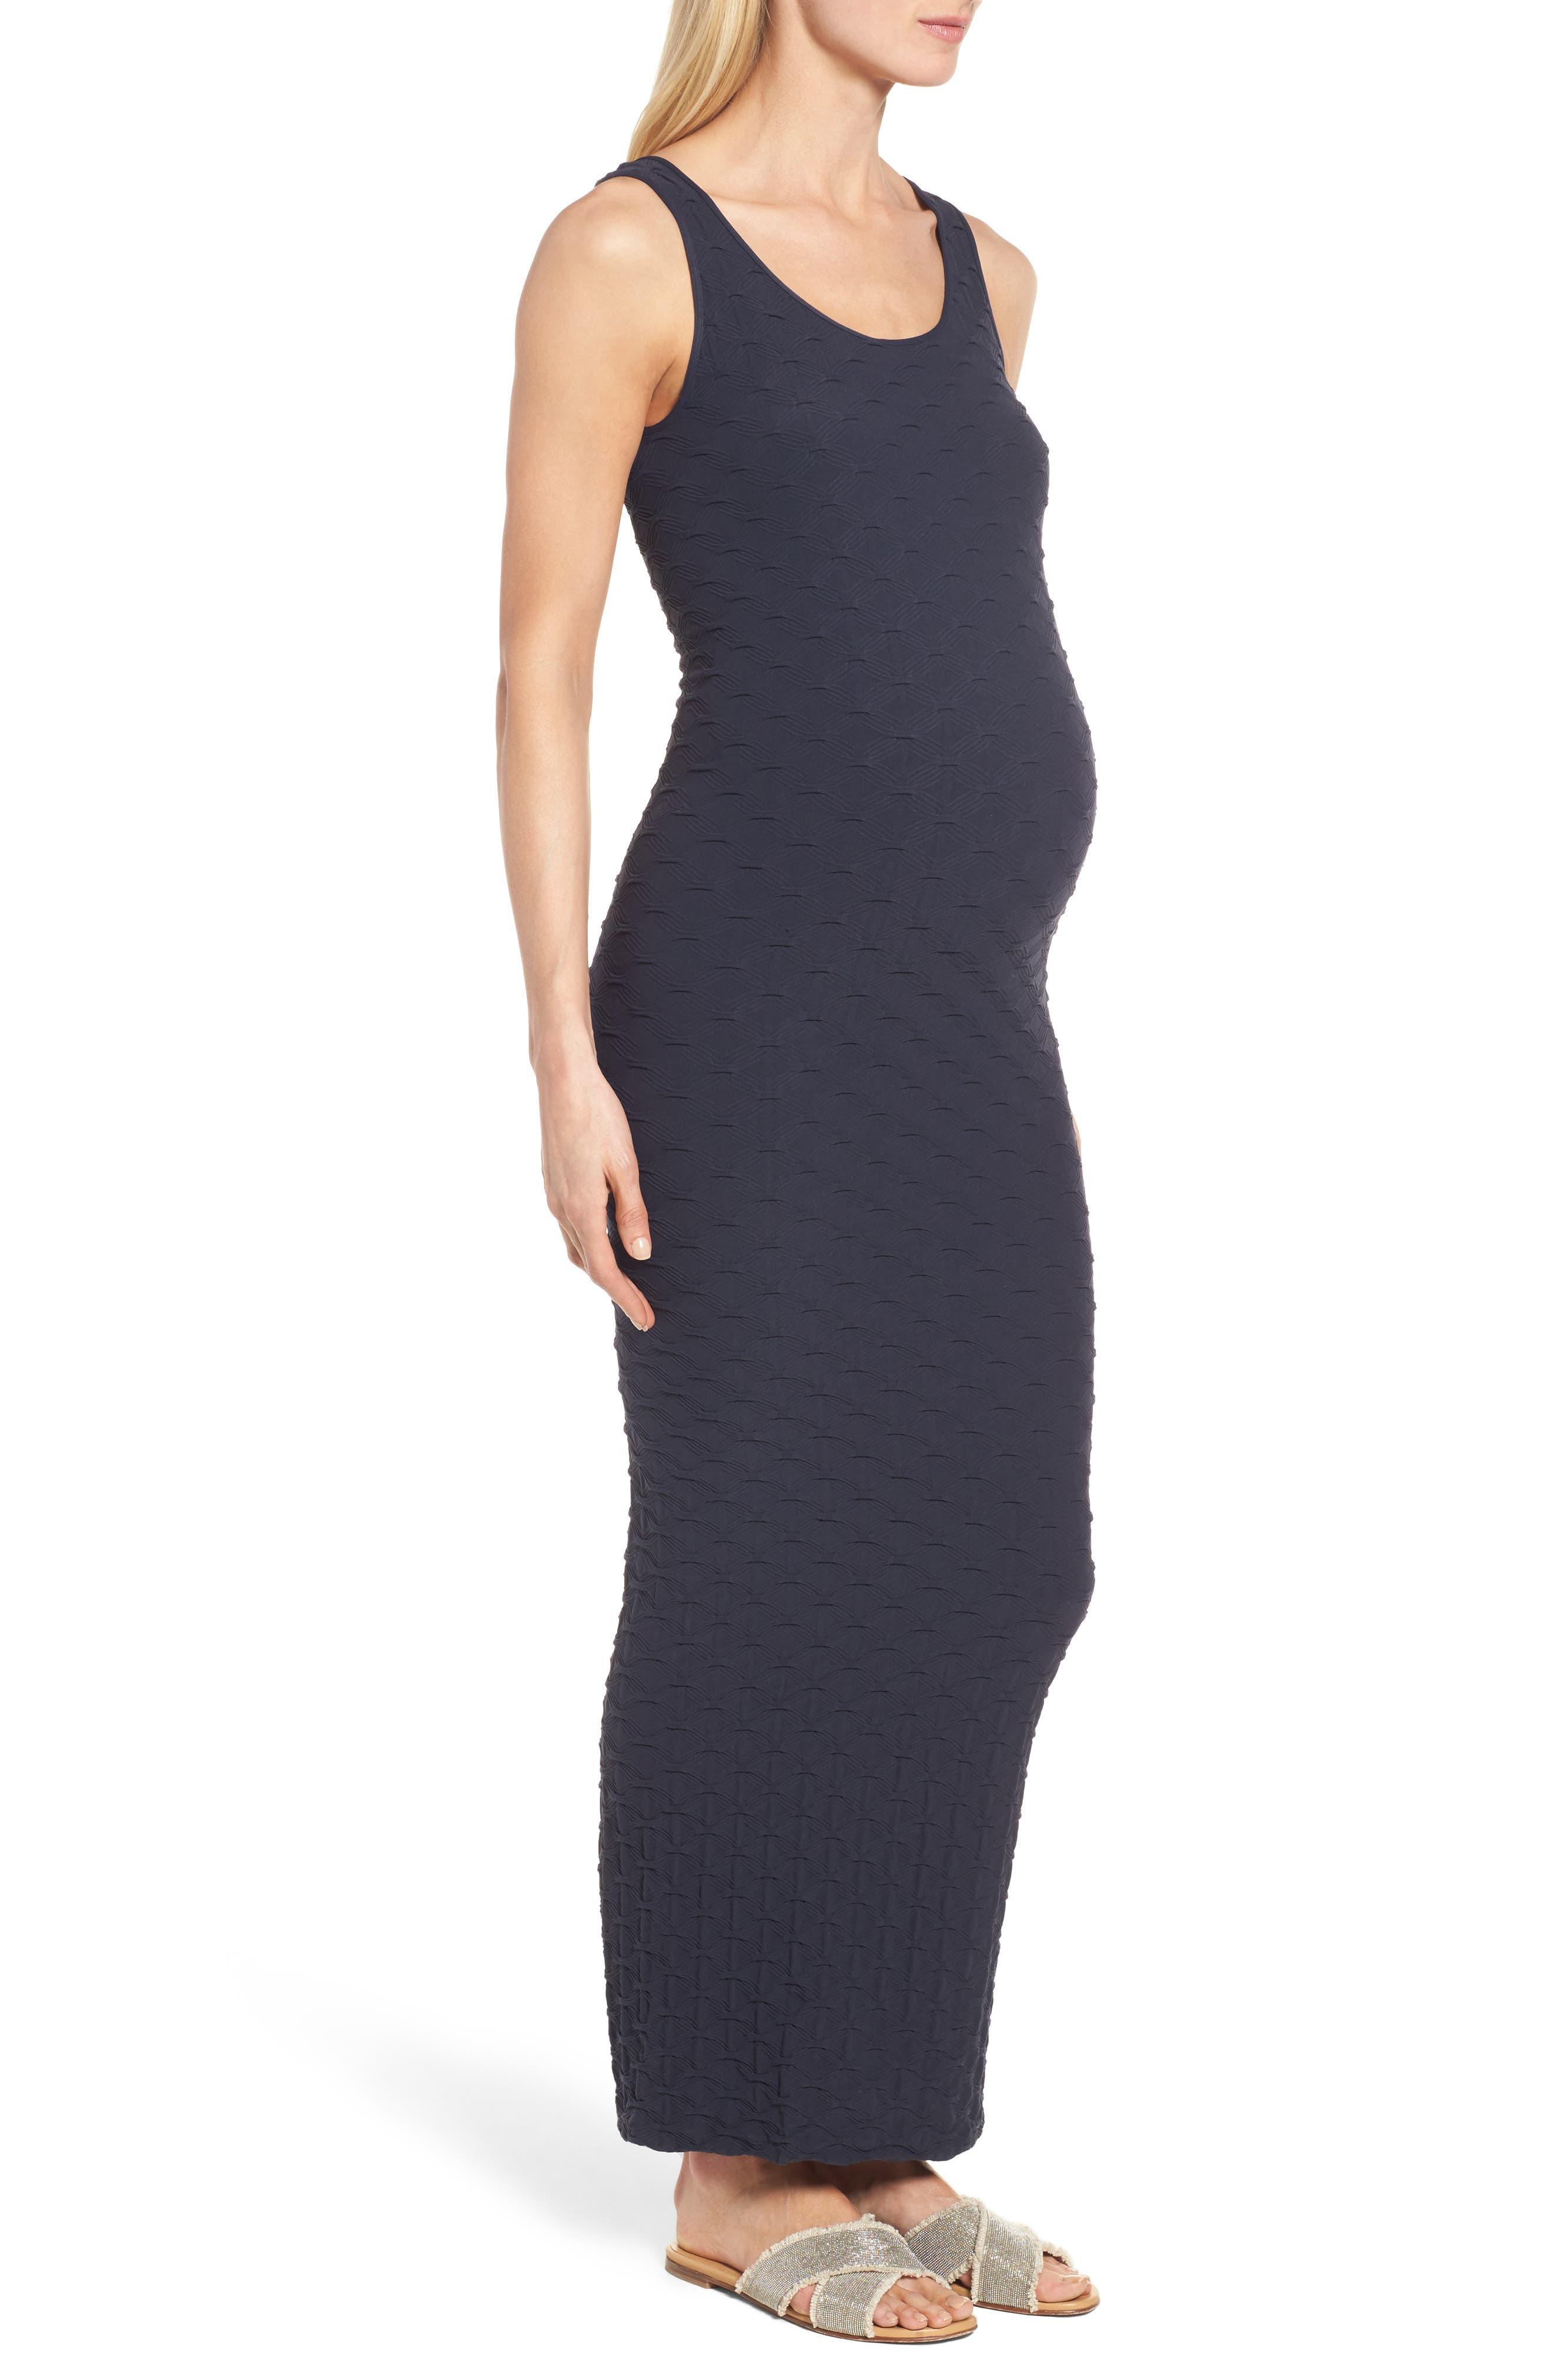 Alternate Image 3  - Tees by Tina 'Lattice' Maxi Maternity Dress